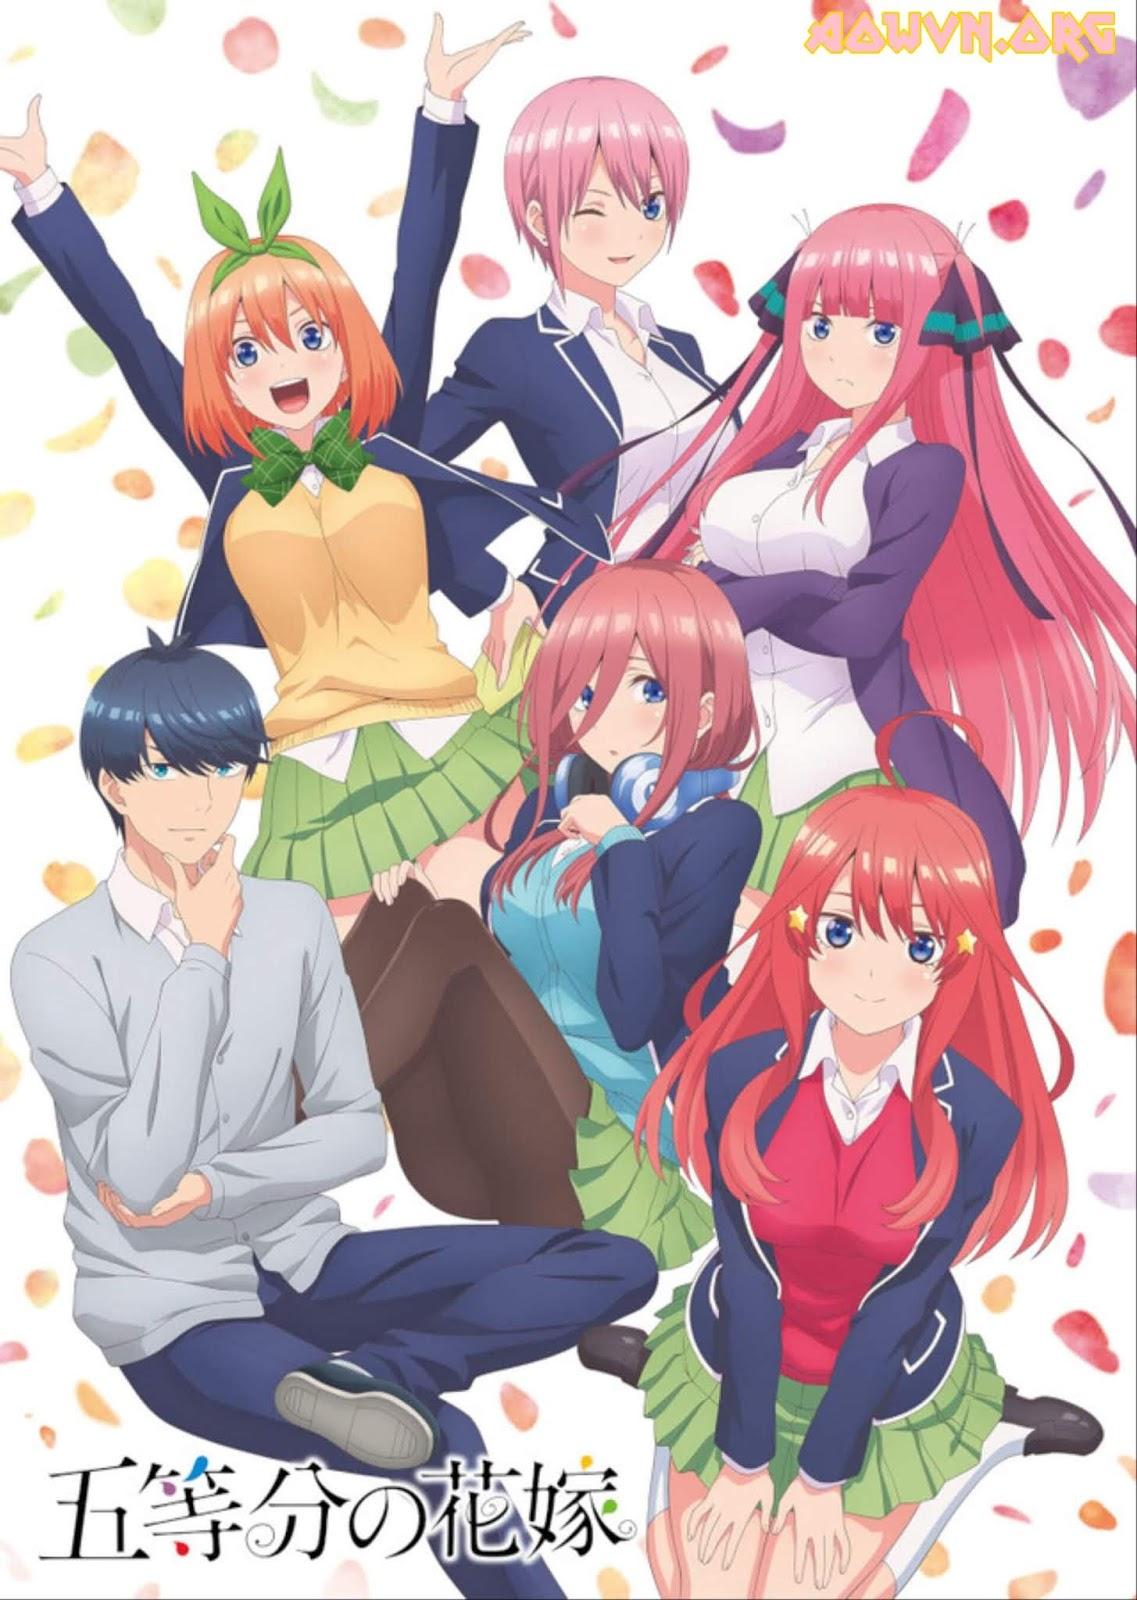 2018122916193699 - [ Anime 3gp Mp4 | Ep 2 ] Gotoubun no Hanayome - Vietsub - Cực hay!!